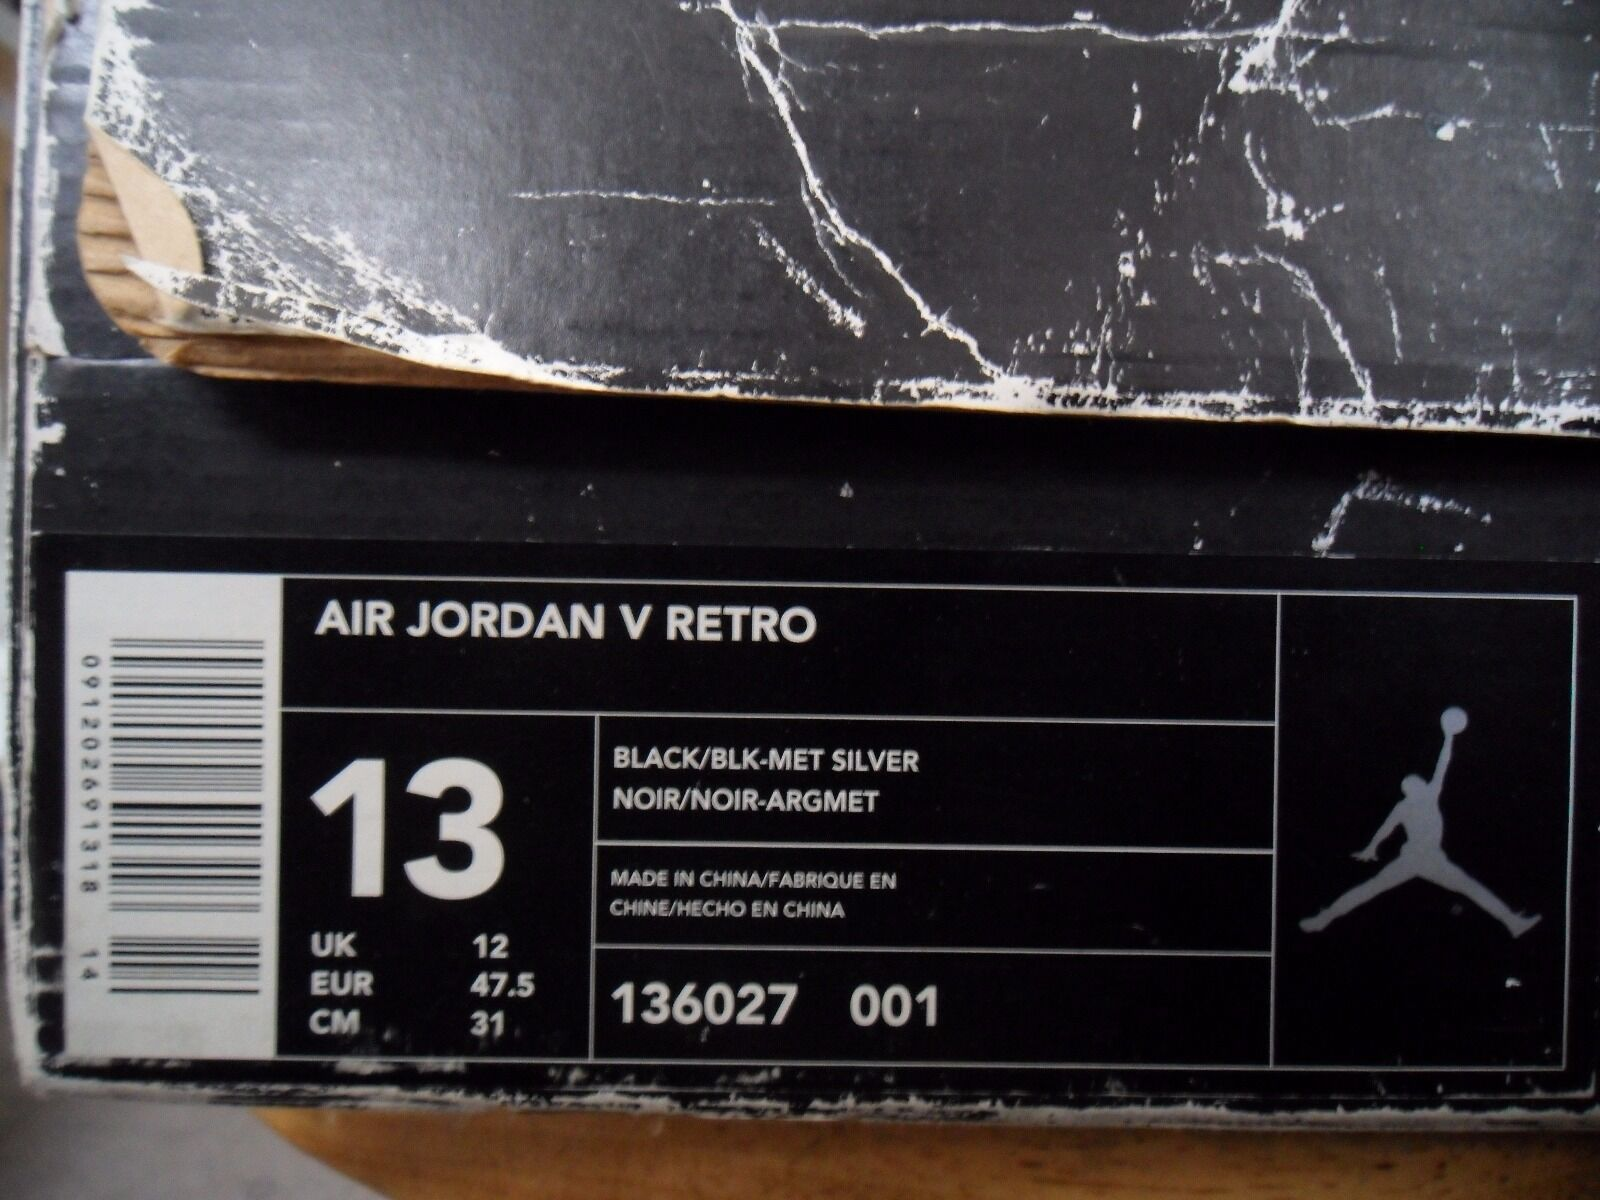 Air Jordan 5V 1 2 3 4 6 7 8 9 10 11 12 13 14 I II III IV VI VII VIII IX X XI XII